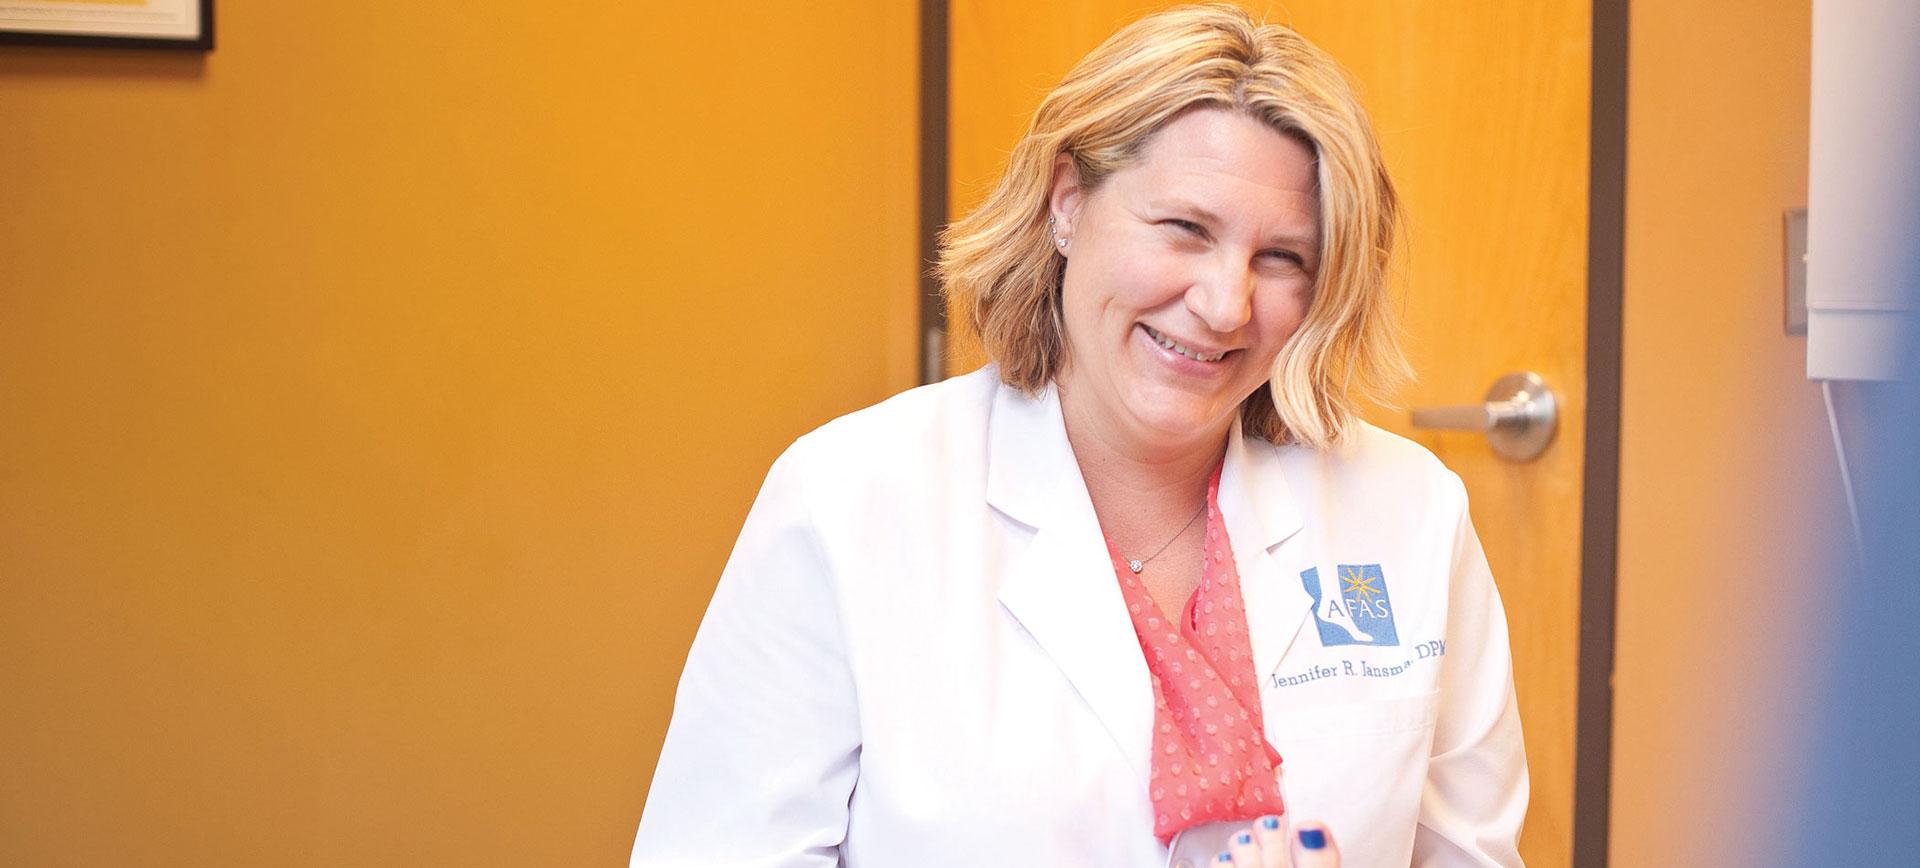 Dr. Jennifer Jansma